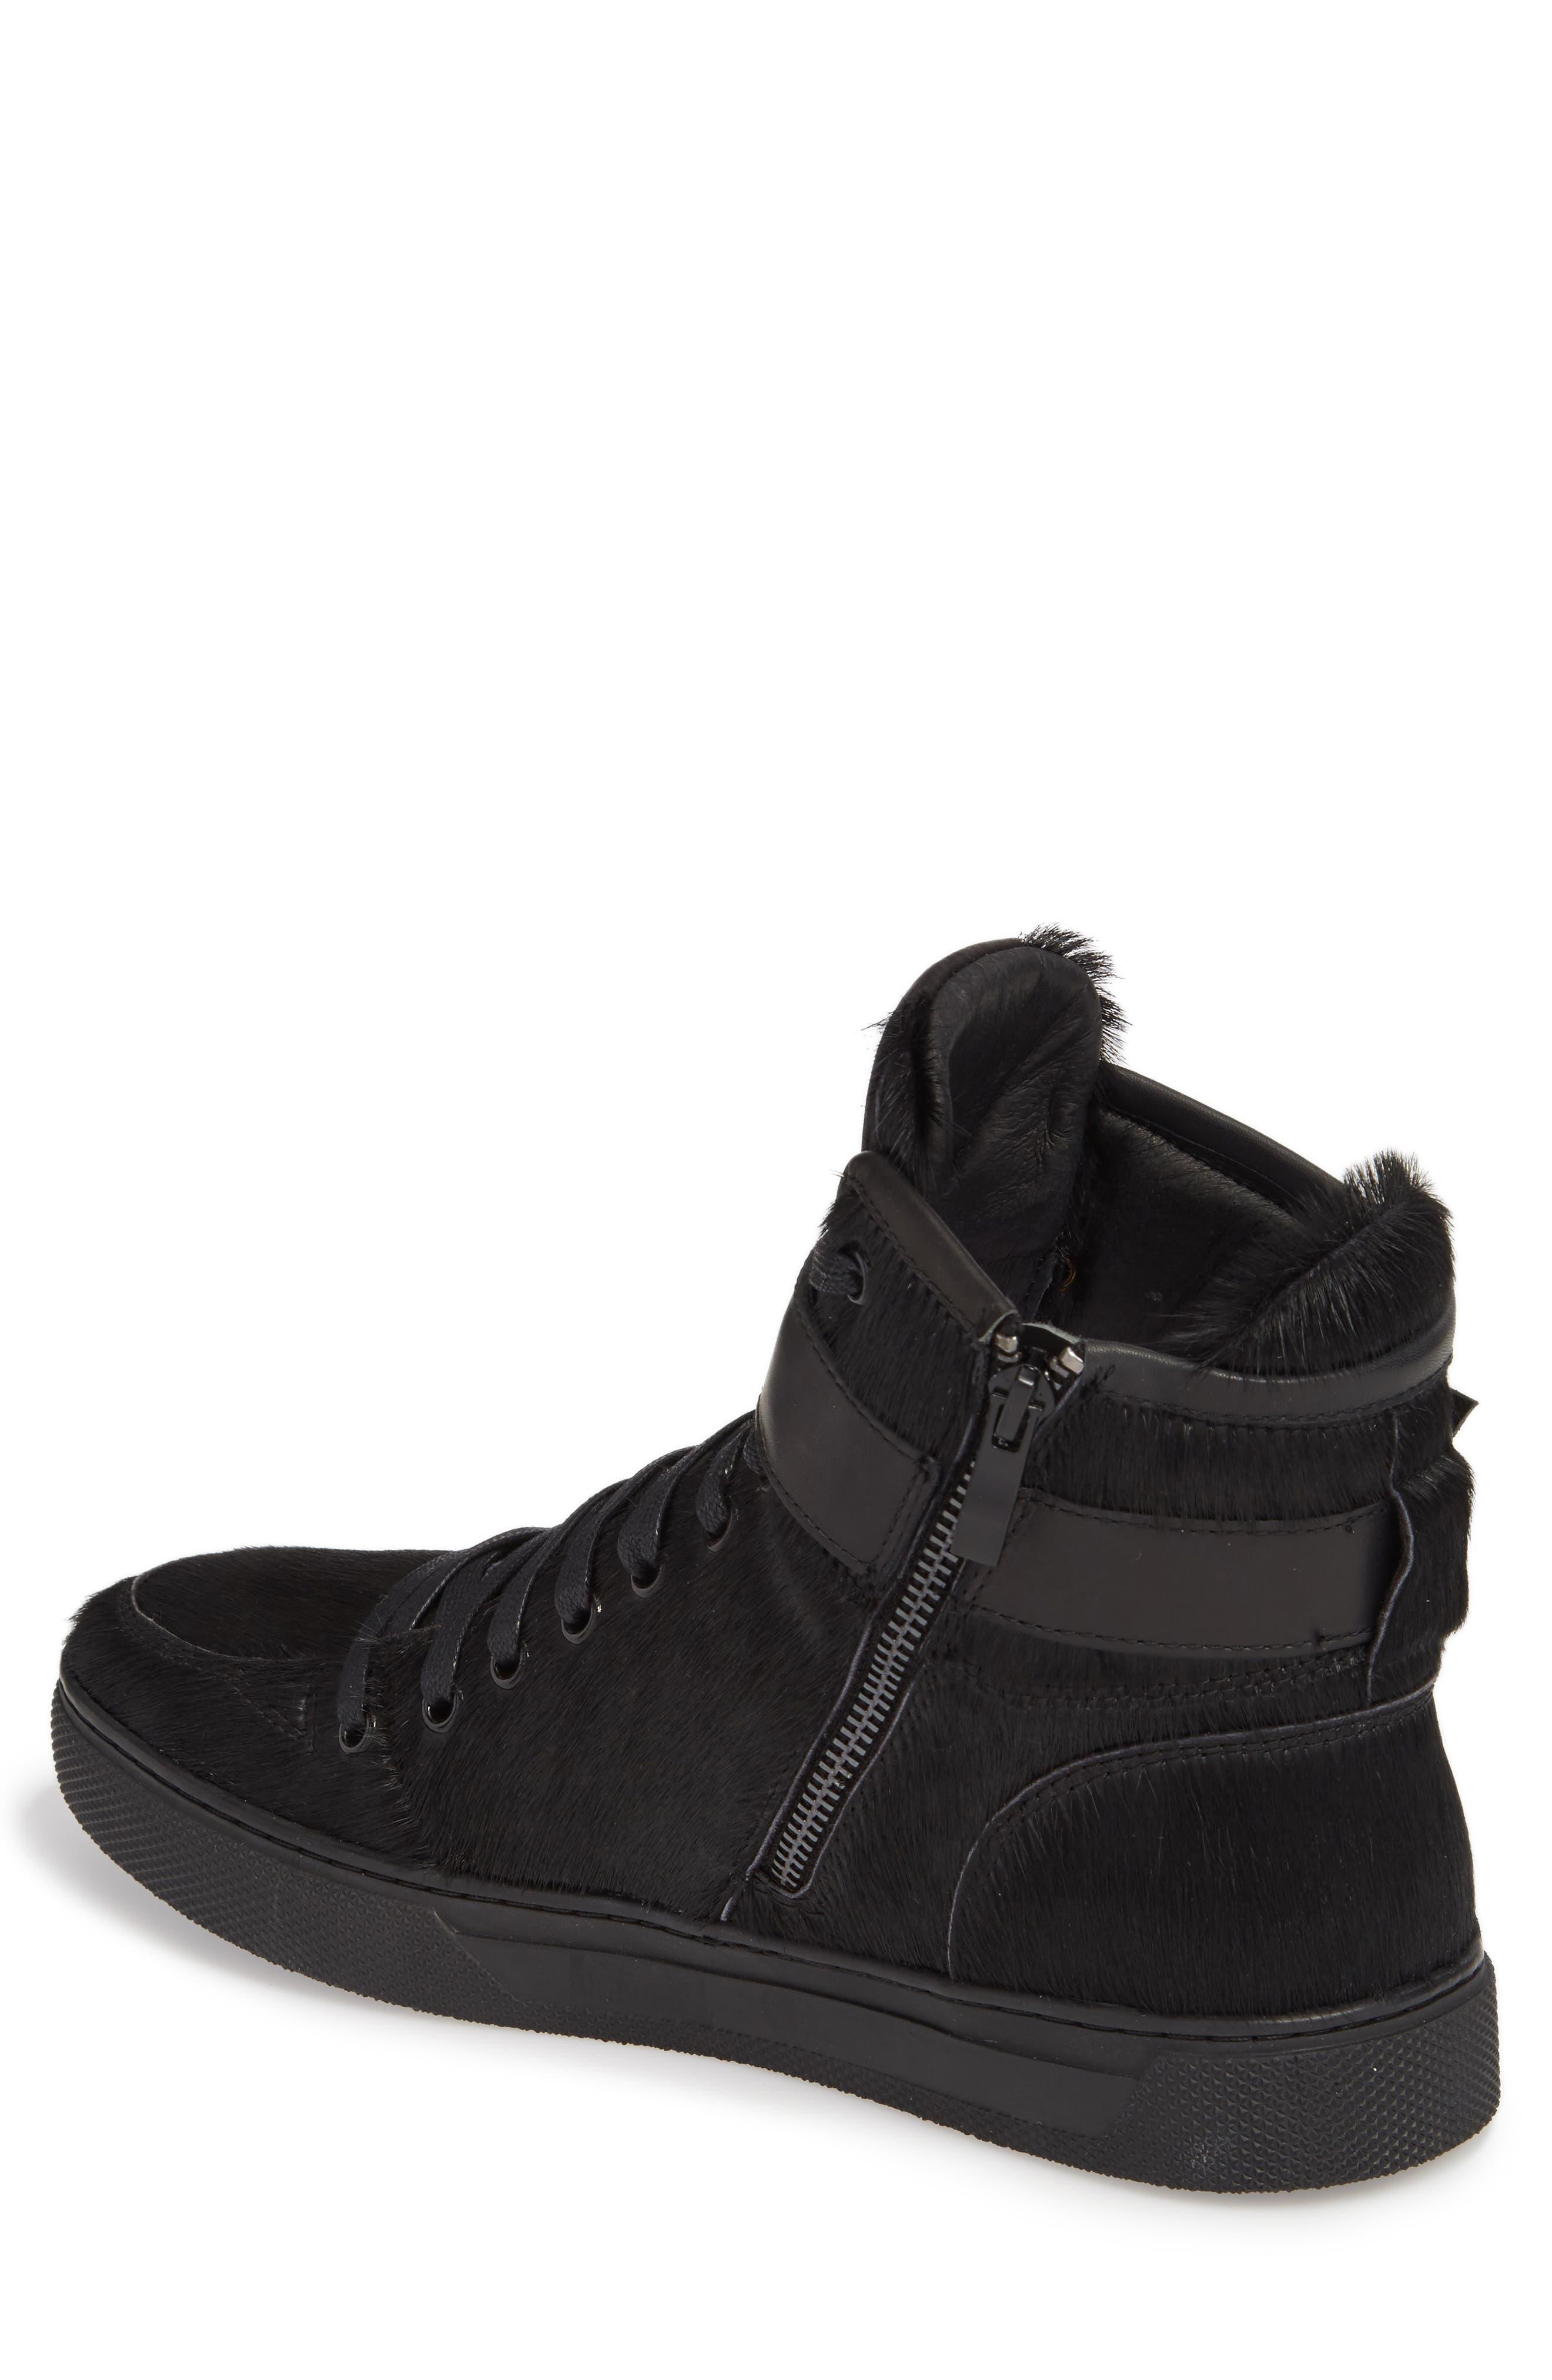 Sullivan Genuine Calf Hair High Top Sneaker,                             Alternate thumbnail 2, color,                             Black Fur Leather